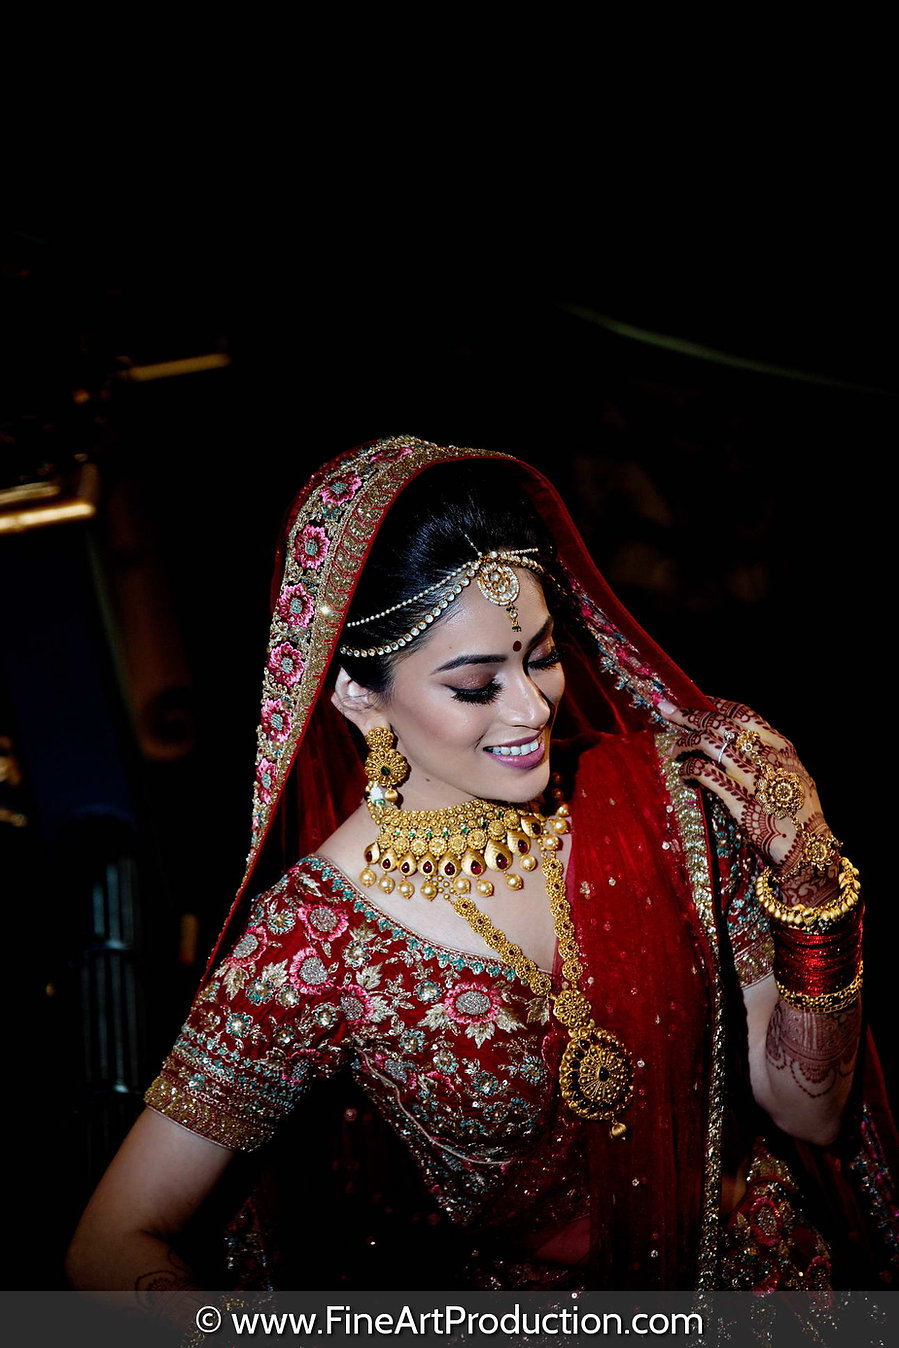 artistic-lighting-bridal-portrait.jpg